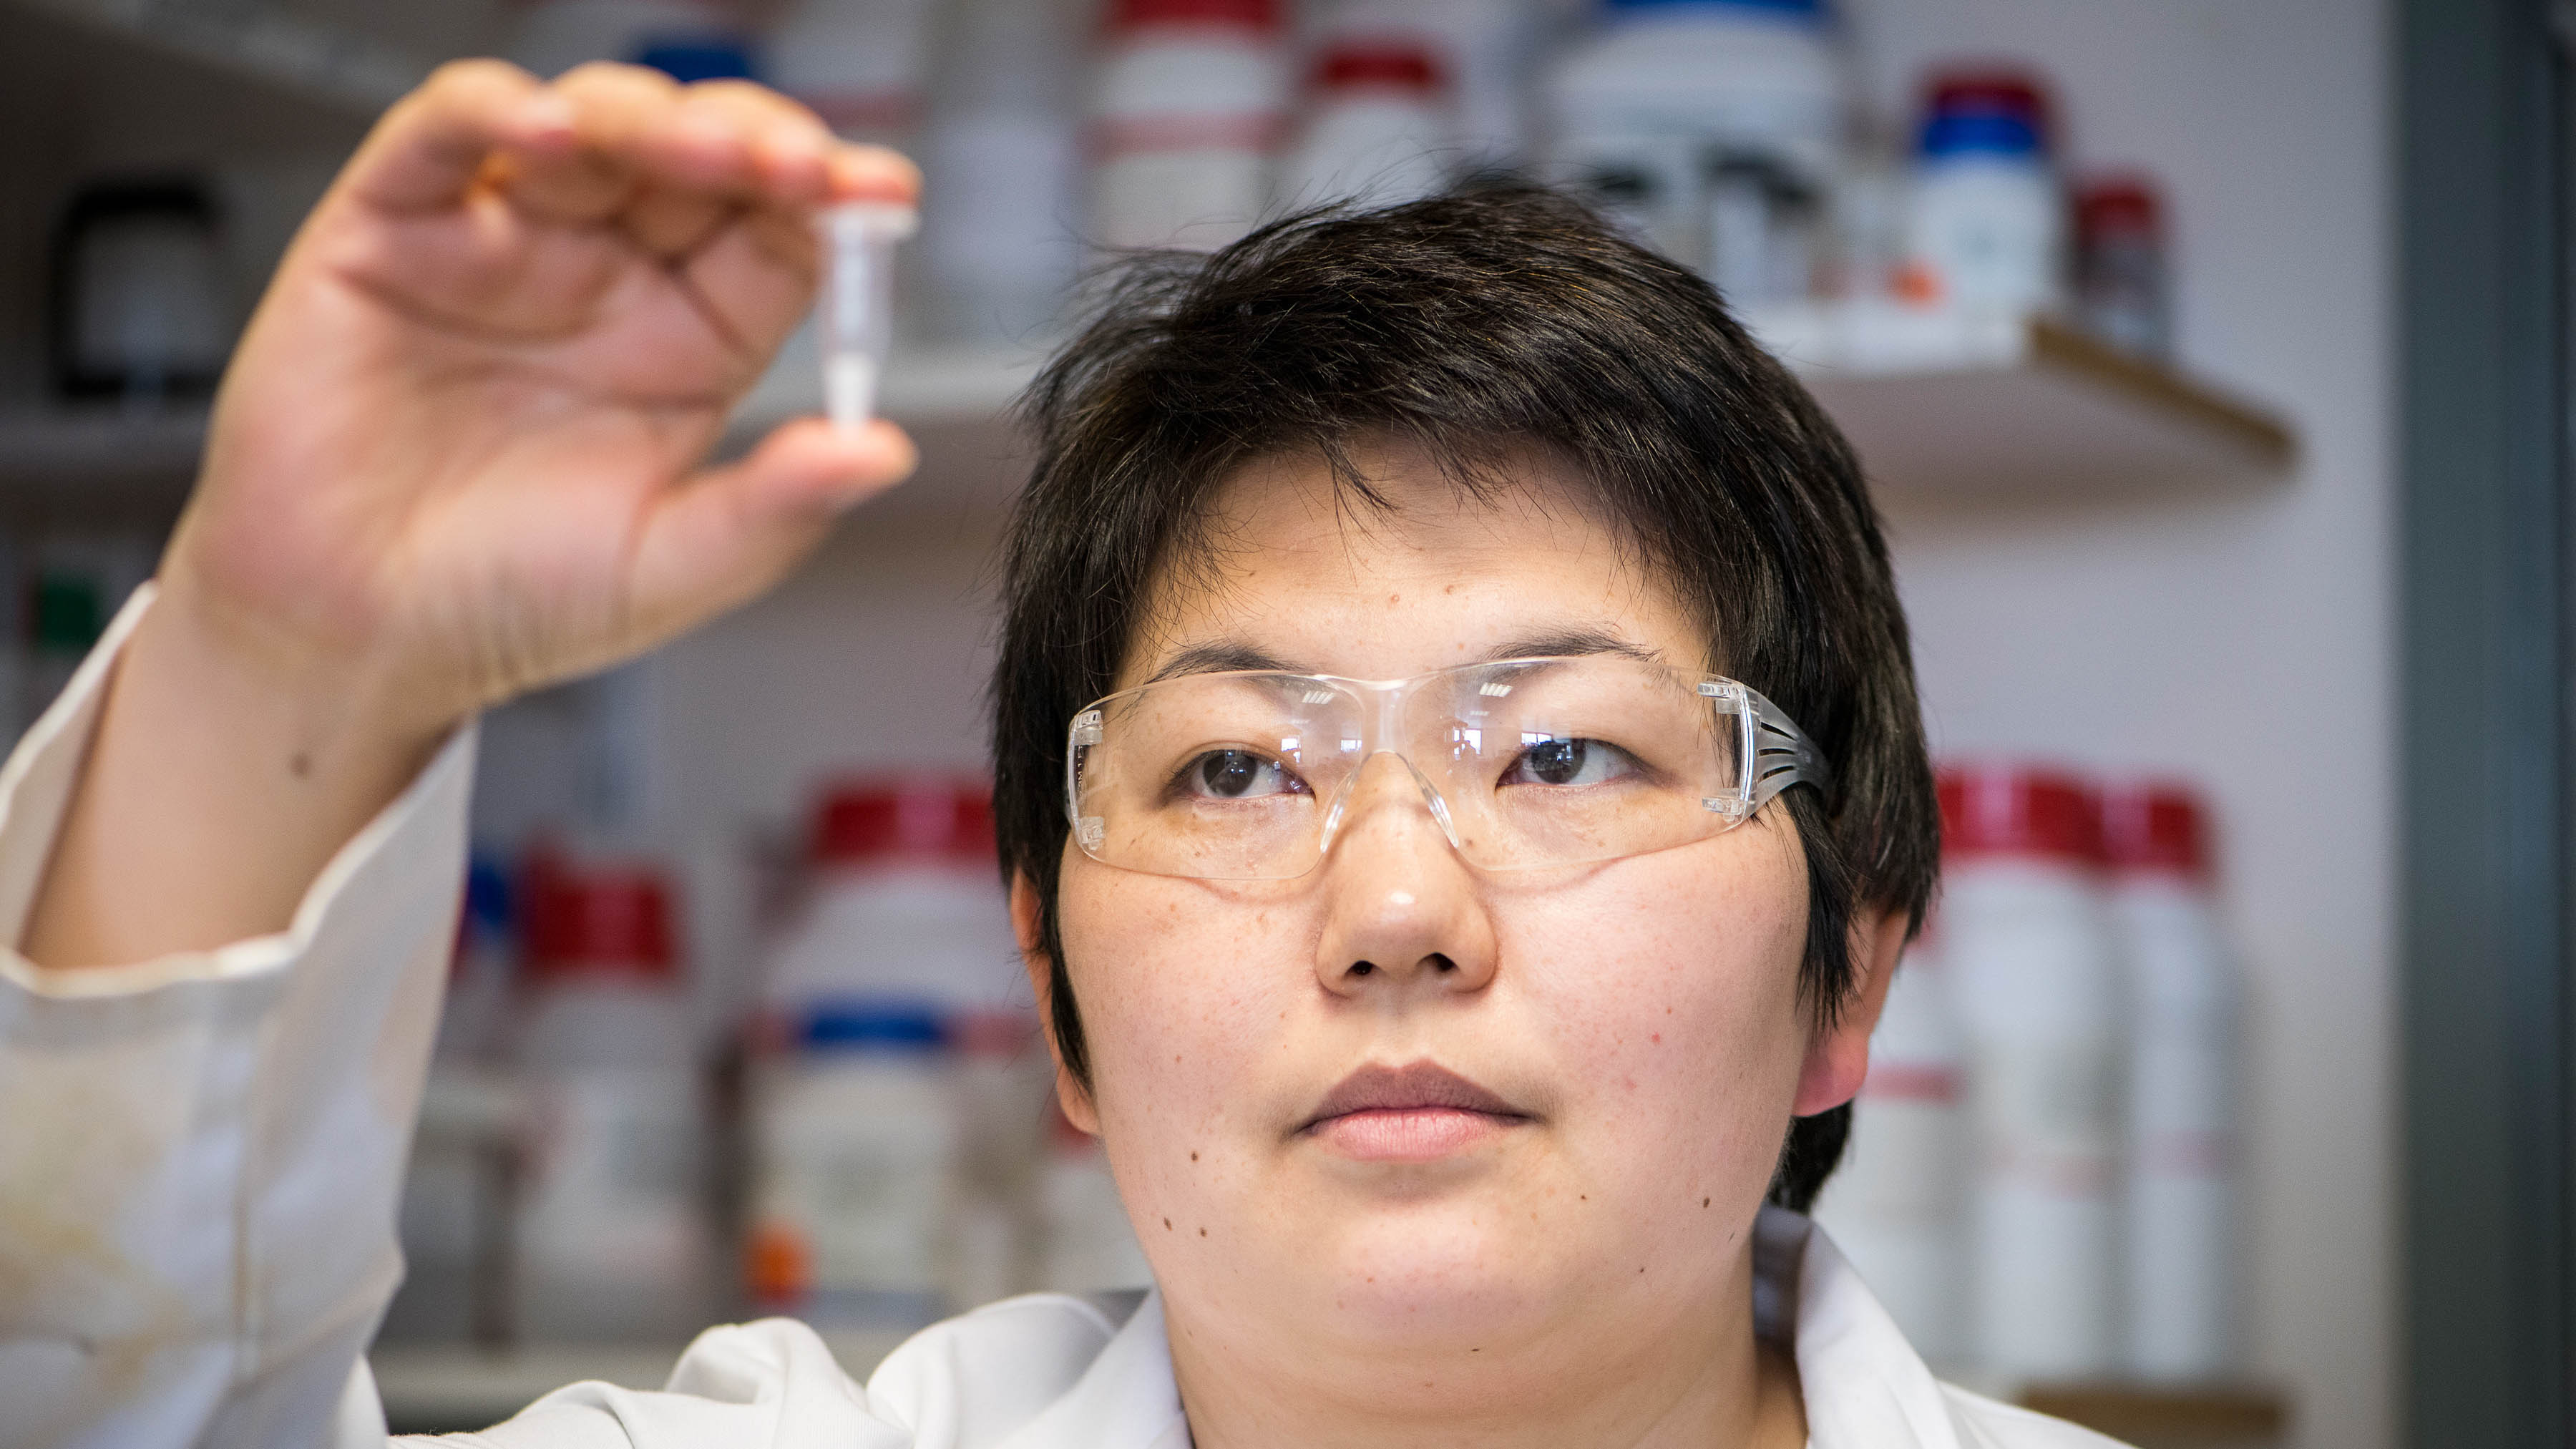 Bath chemist wins award